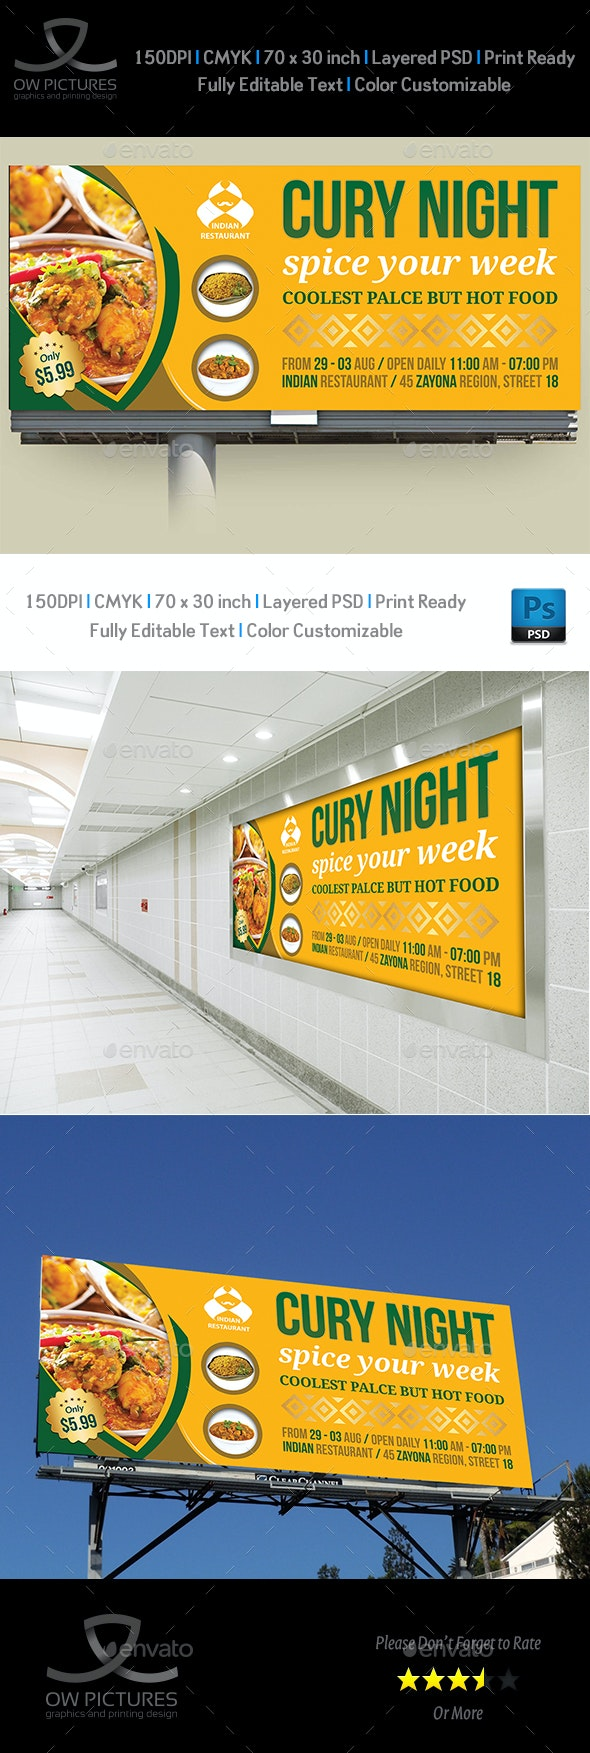 Indian Restaurant Billboard Template - Signage Print Templates